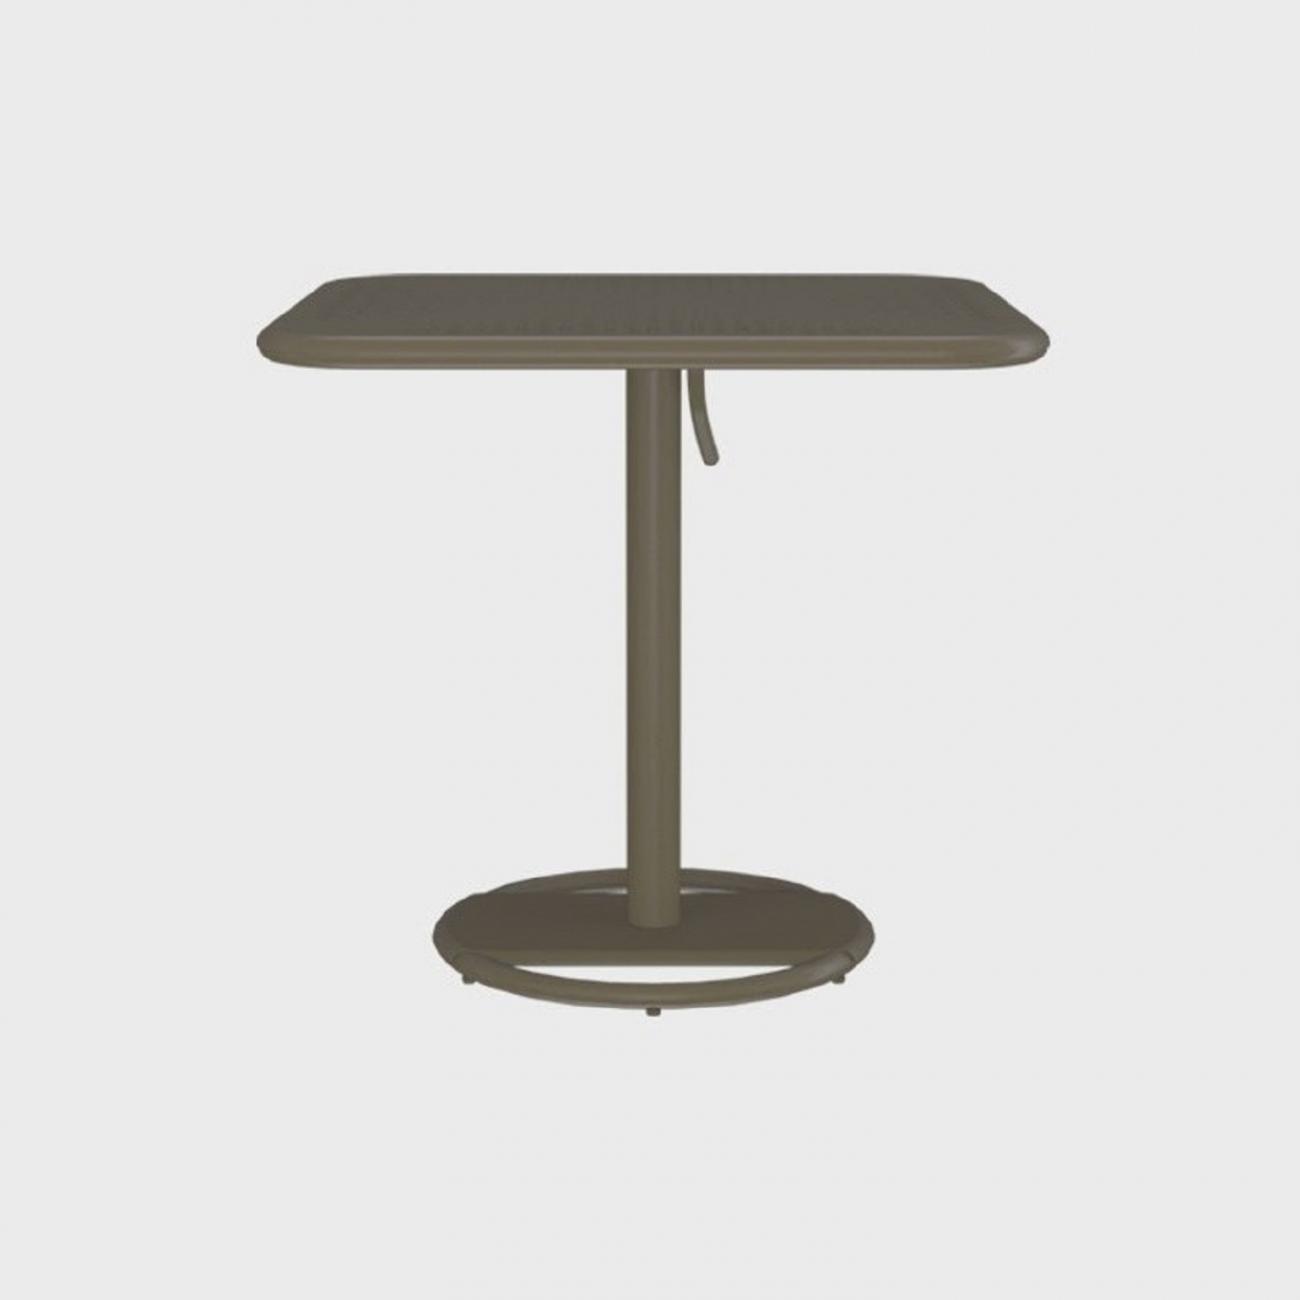 Maiori kose square bistro table dun tattahome maiori kose square bistro table dun watchthetrailerfo